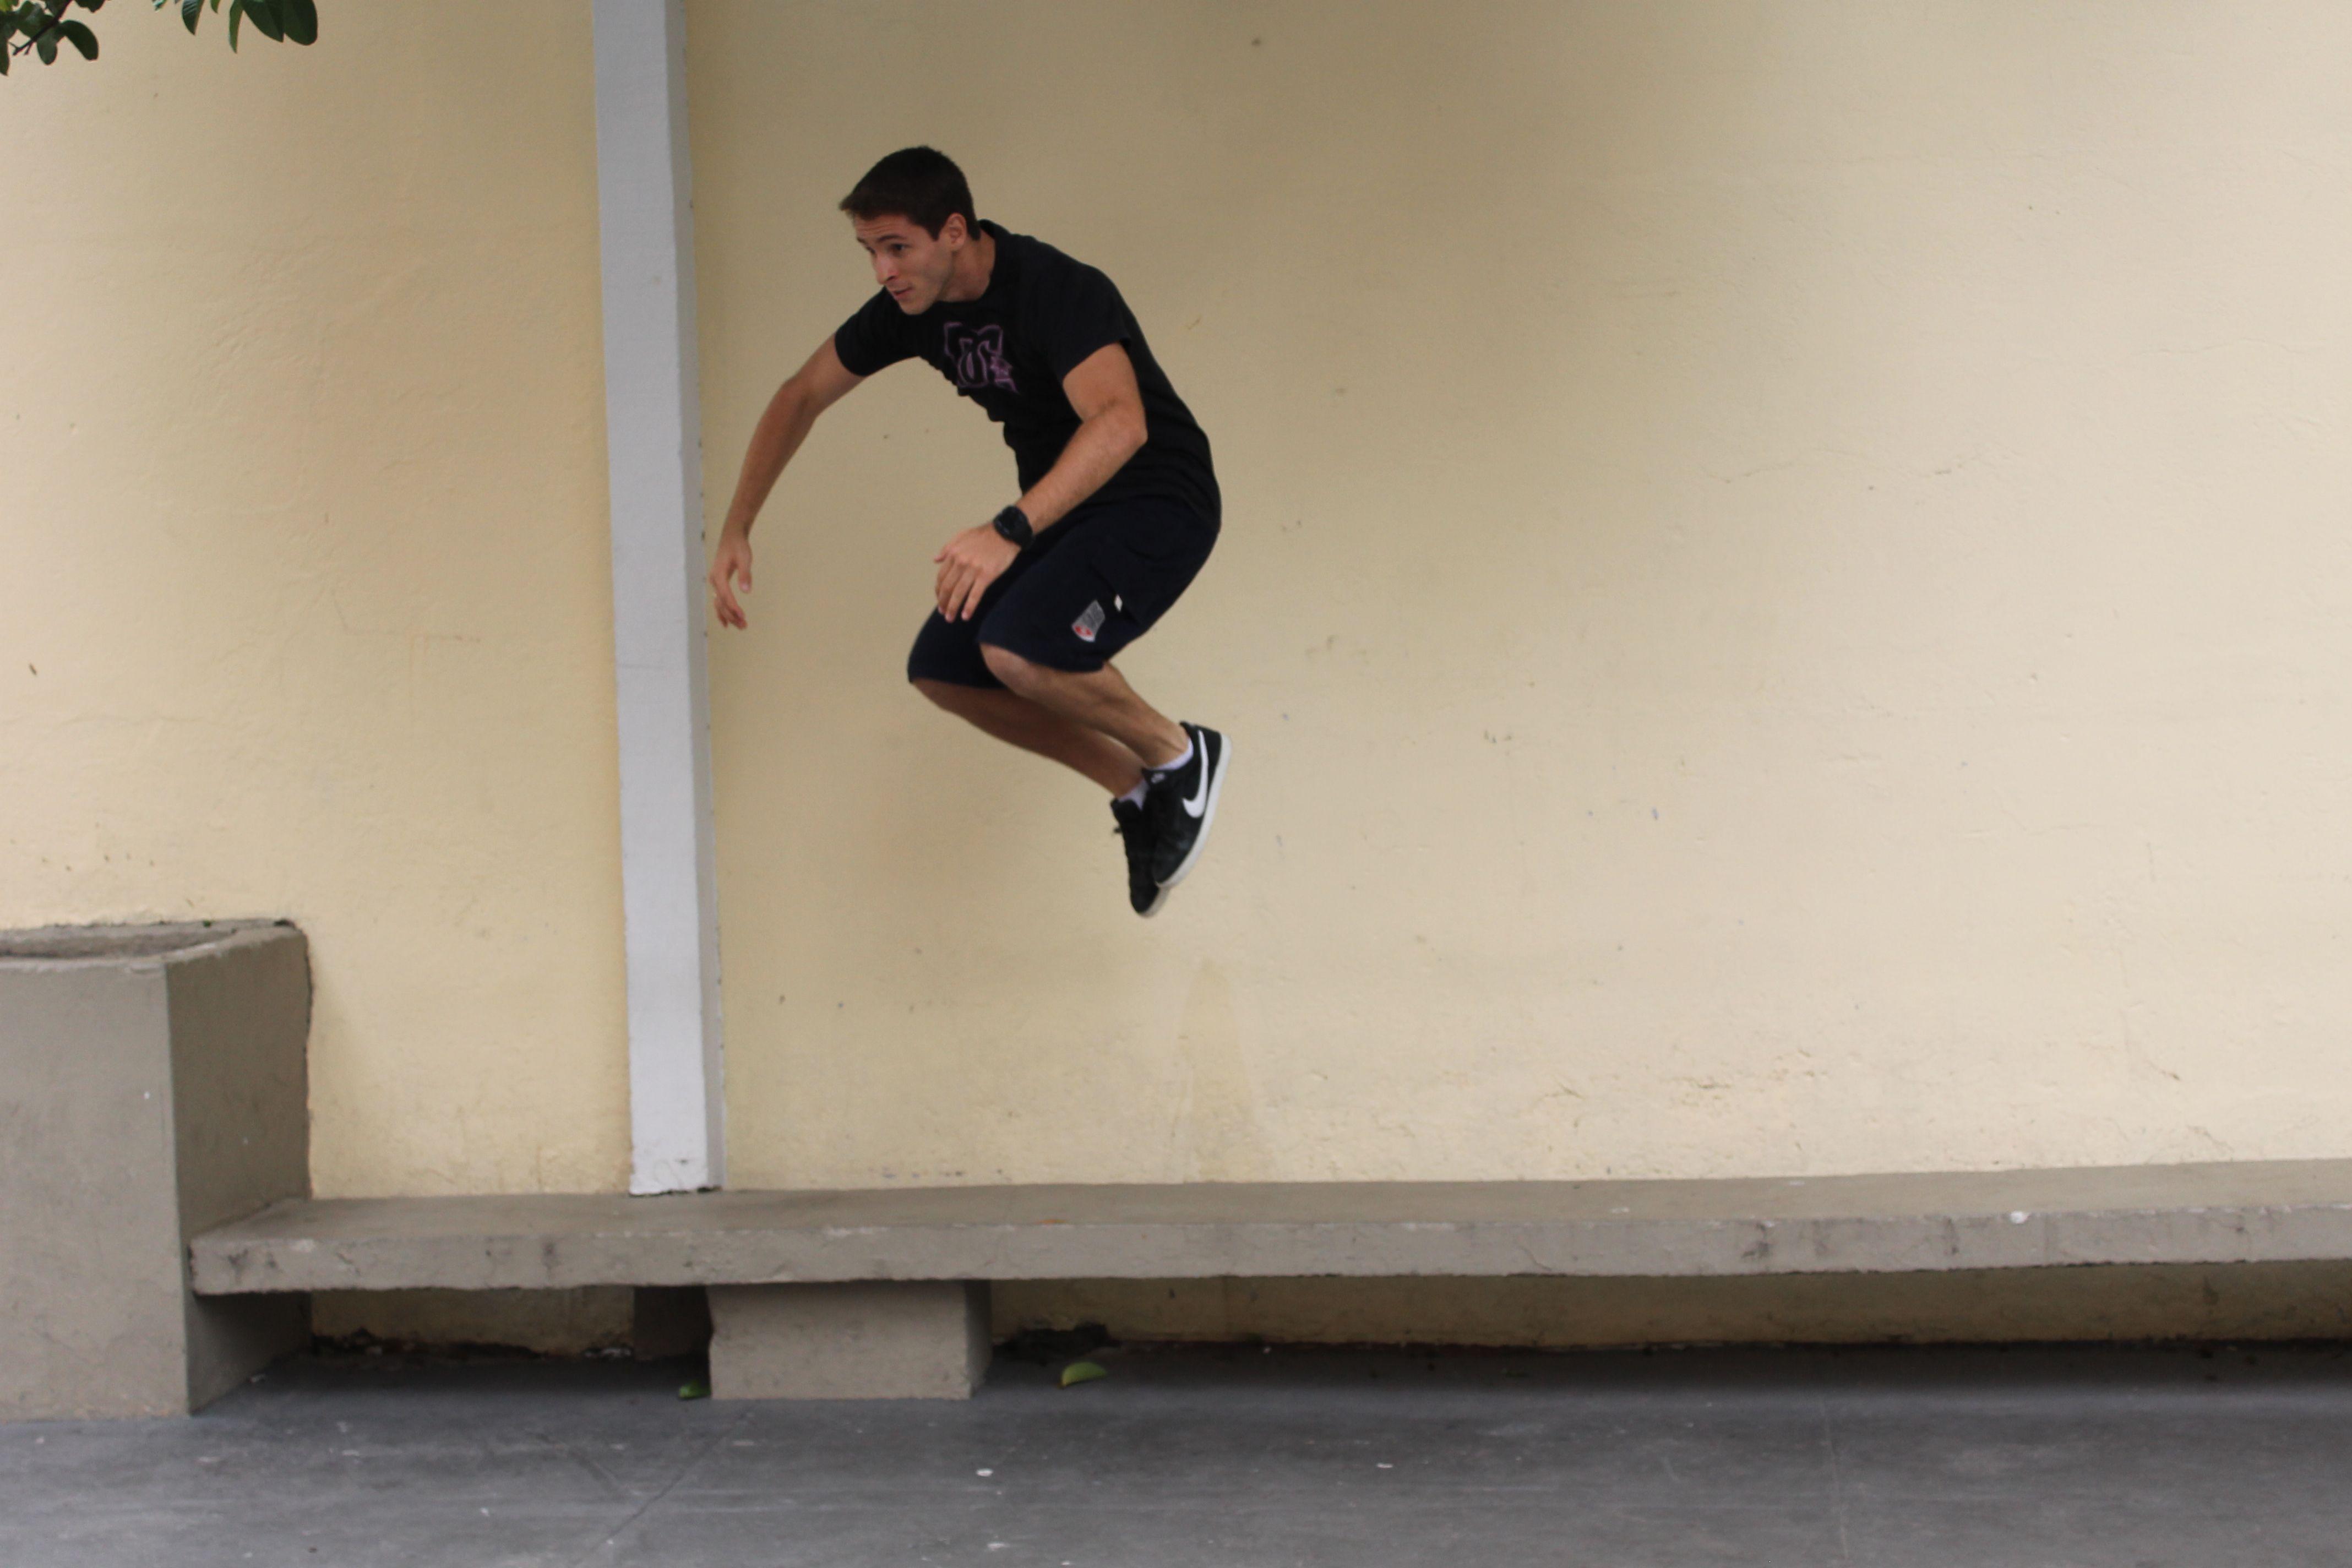 Vamos pular.